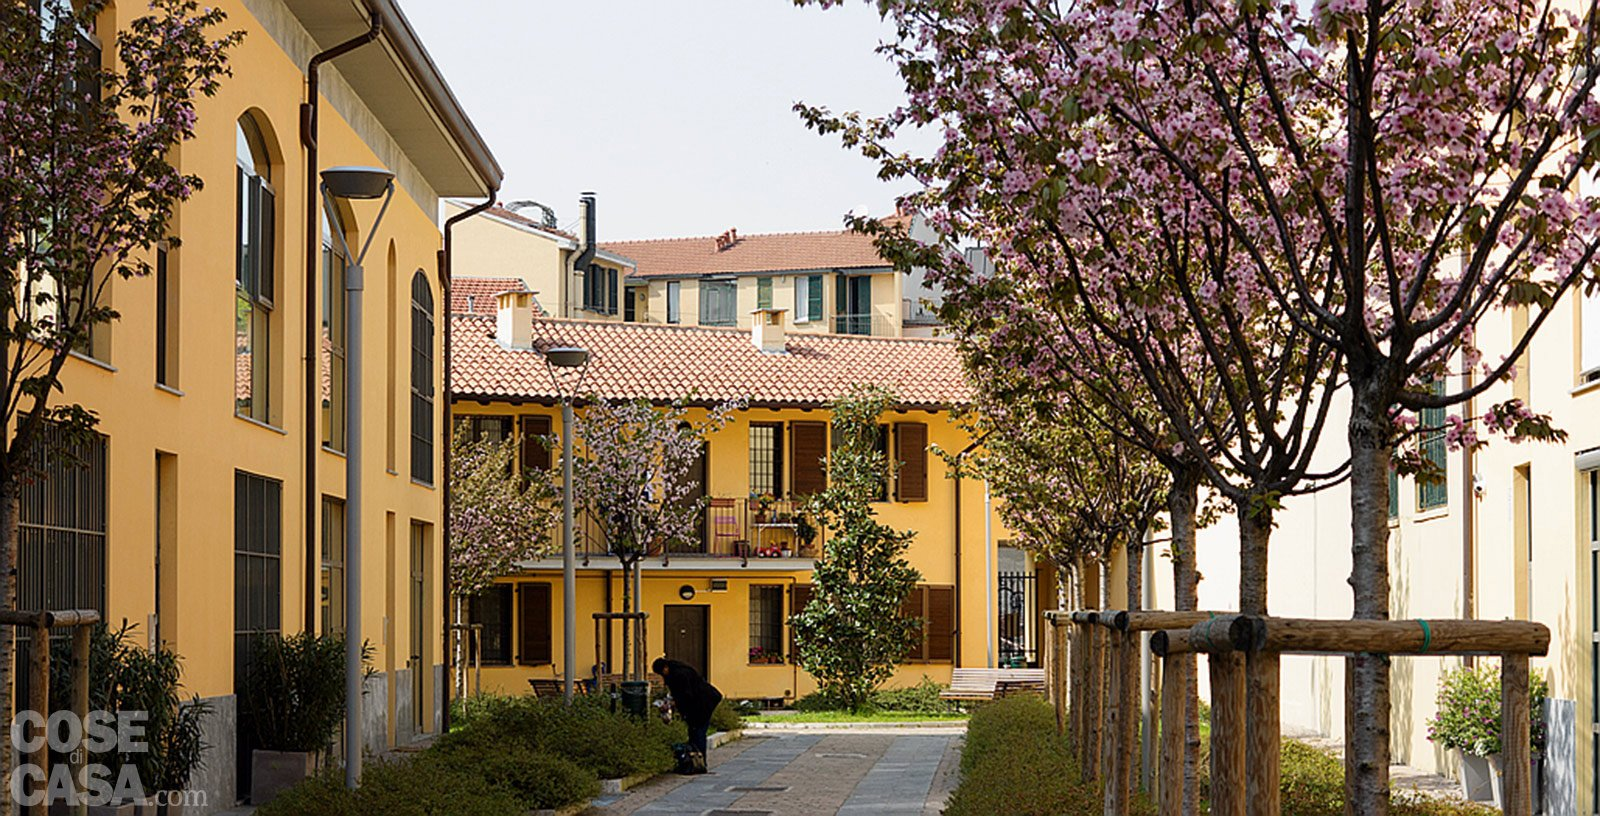 Lovely Casa Magnaghi Fiorentini Esterno Viale